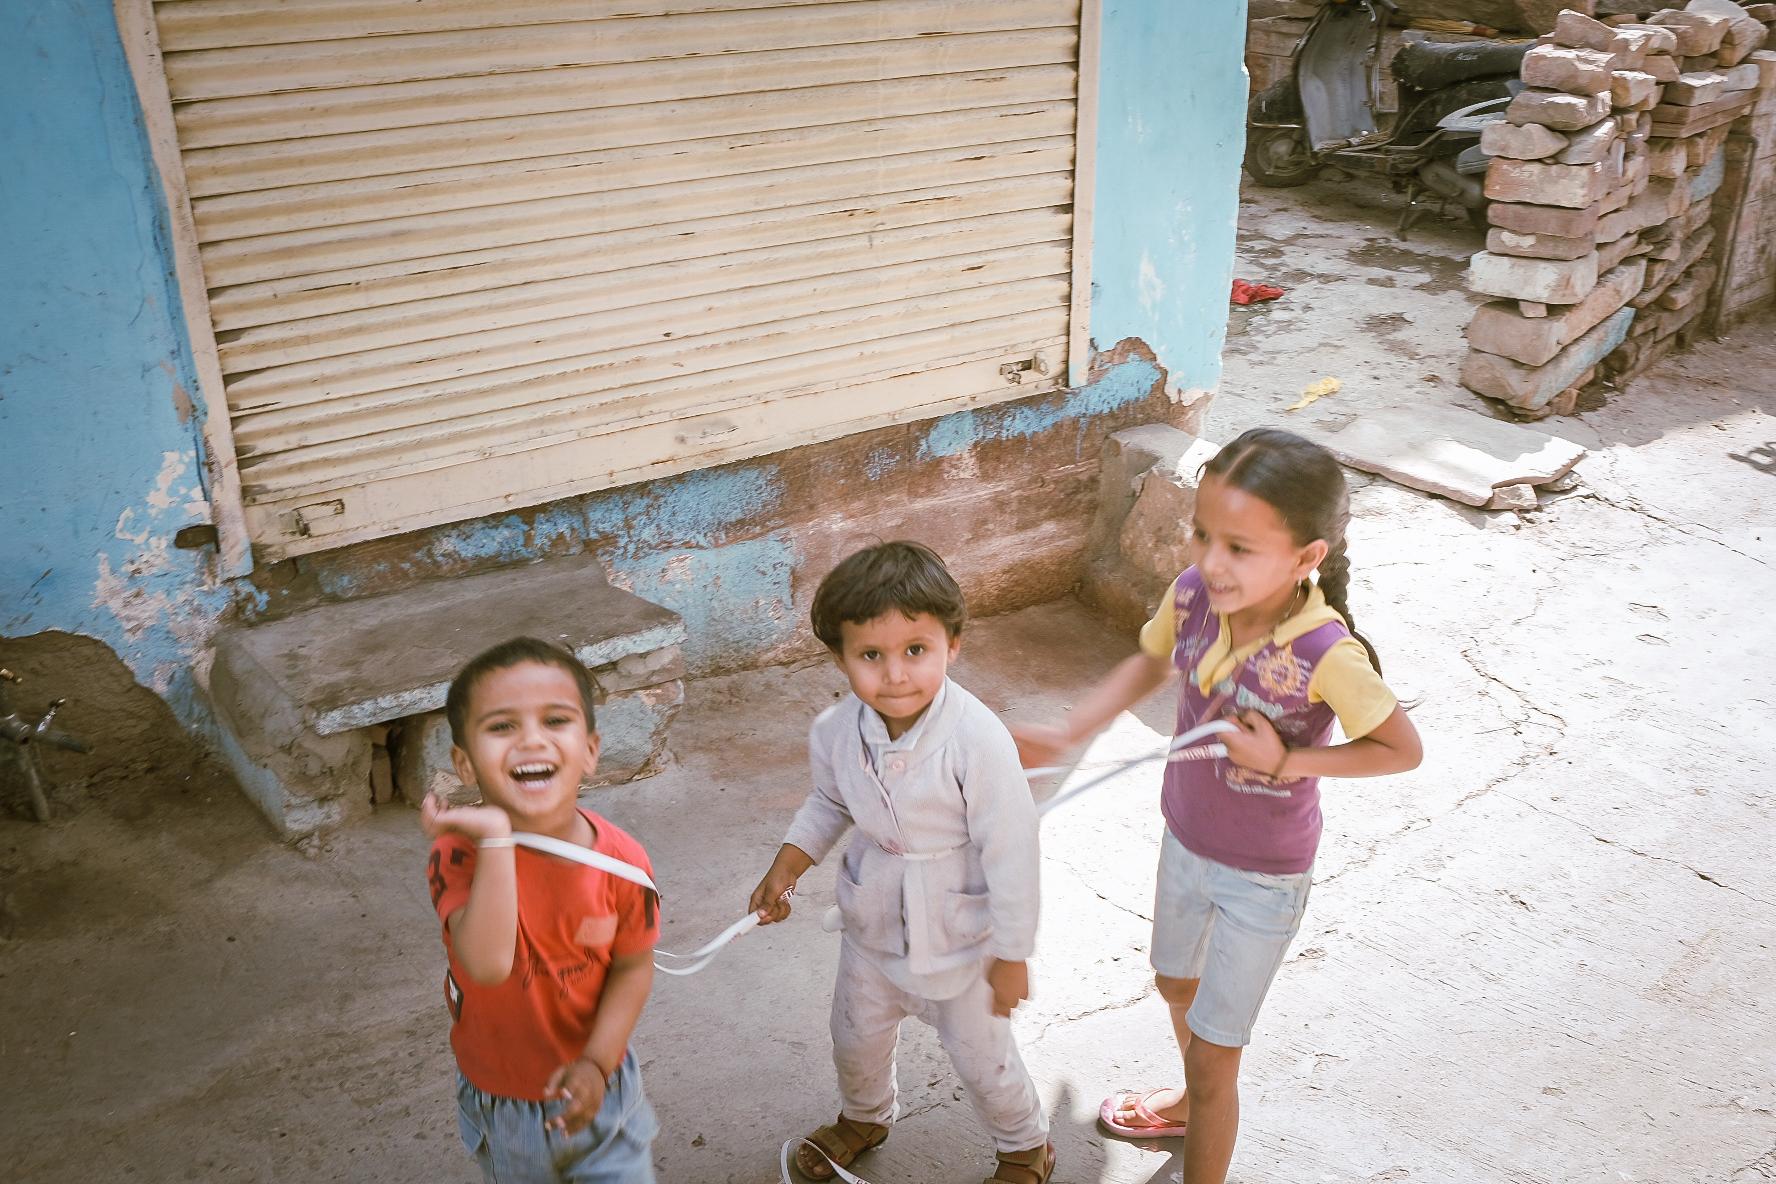 Jodhpur Kids & Fruits involved in Street Photography